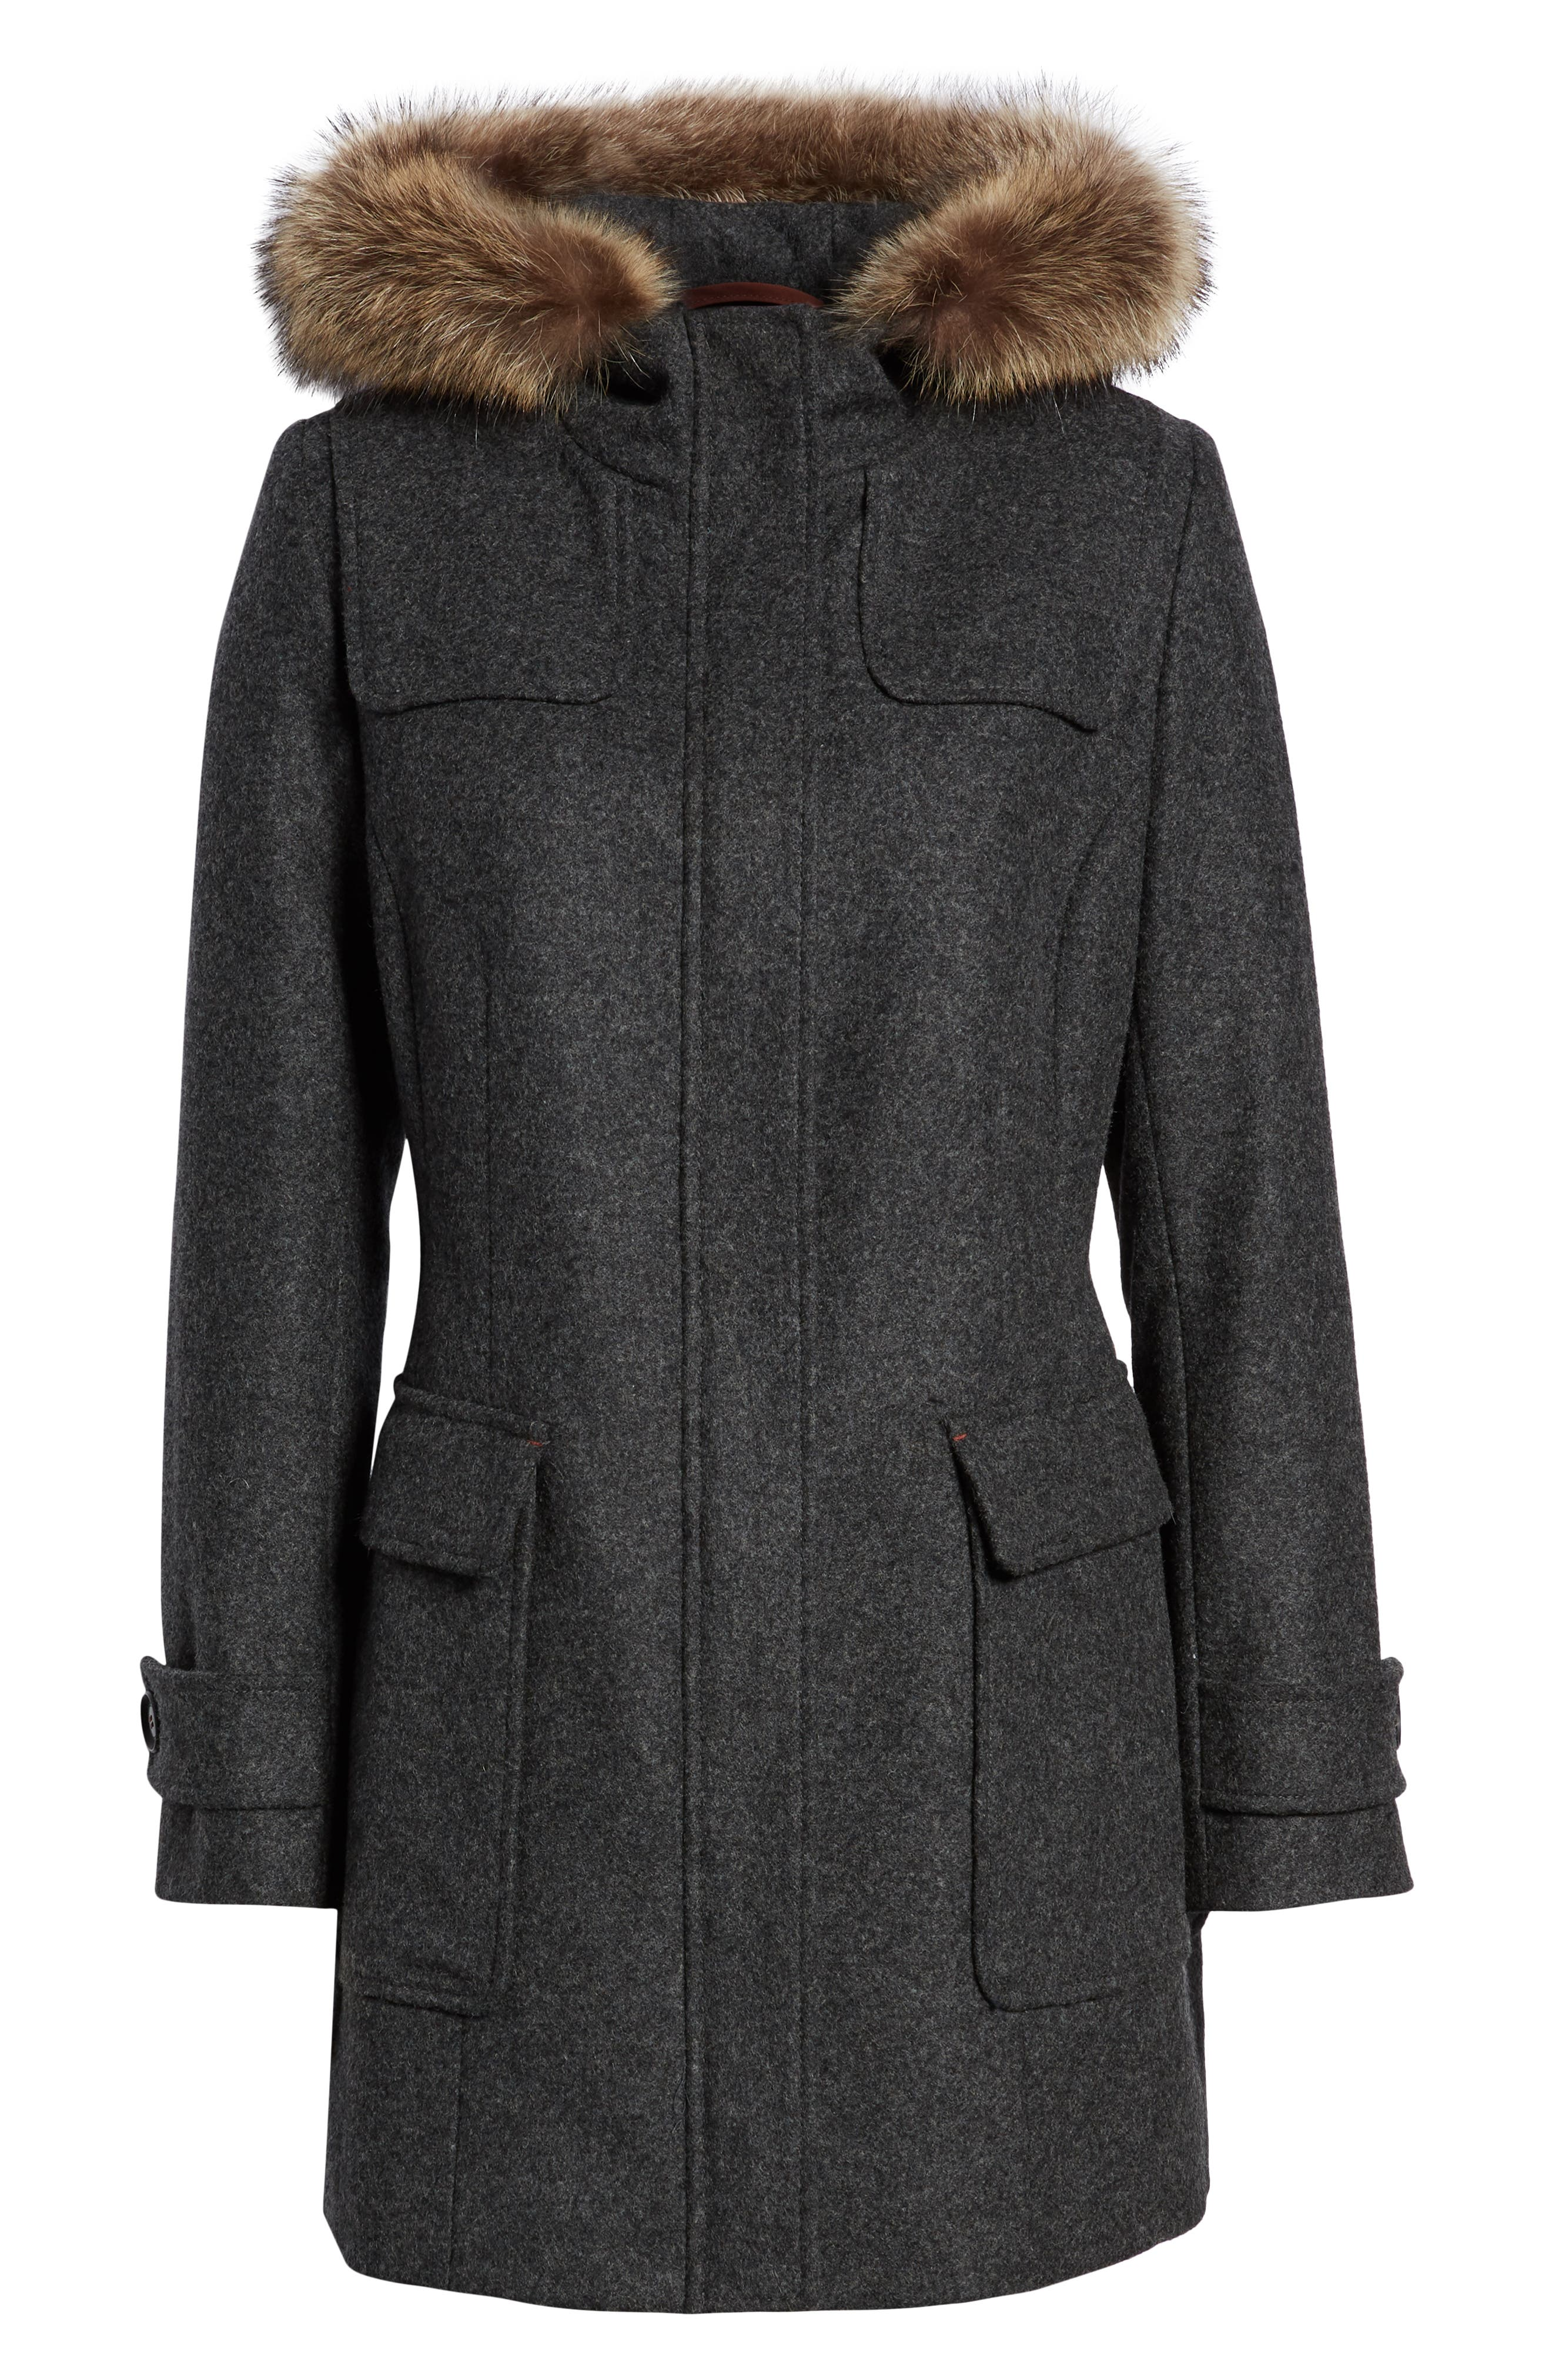 Portland Wool Duffle Coat with Genuine Fur Trim,                             Alternate thumbnail 6, color,                             ASH MEL